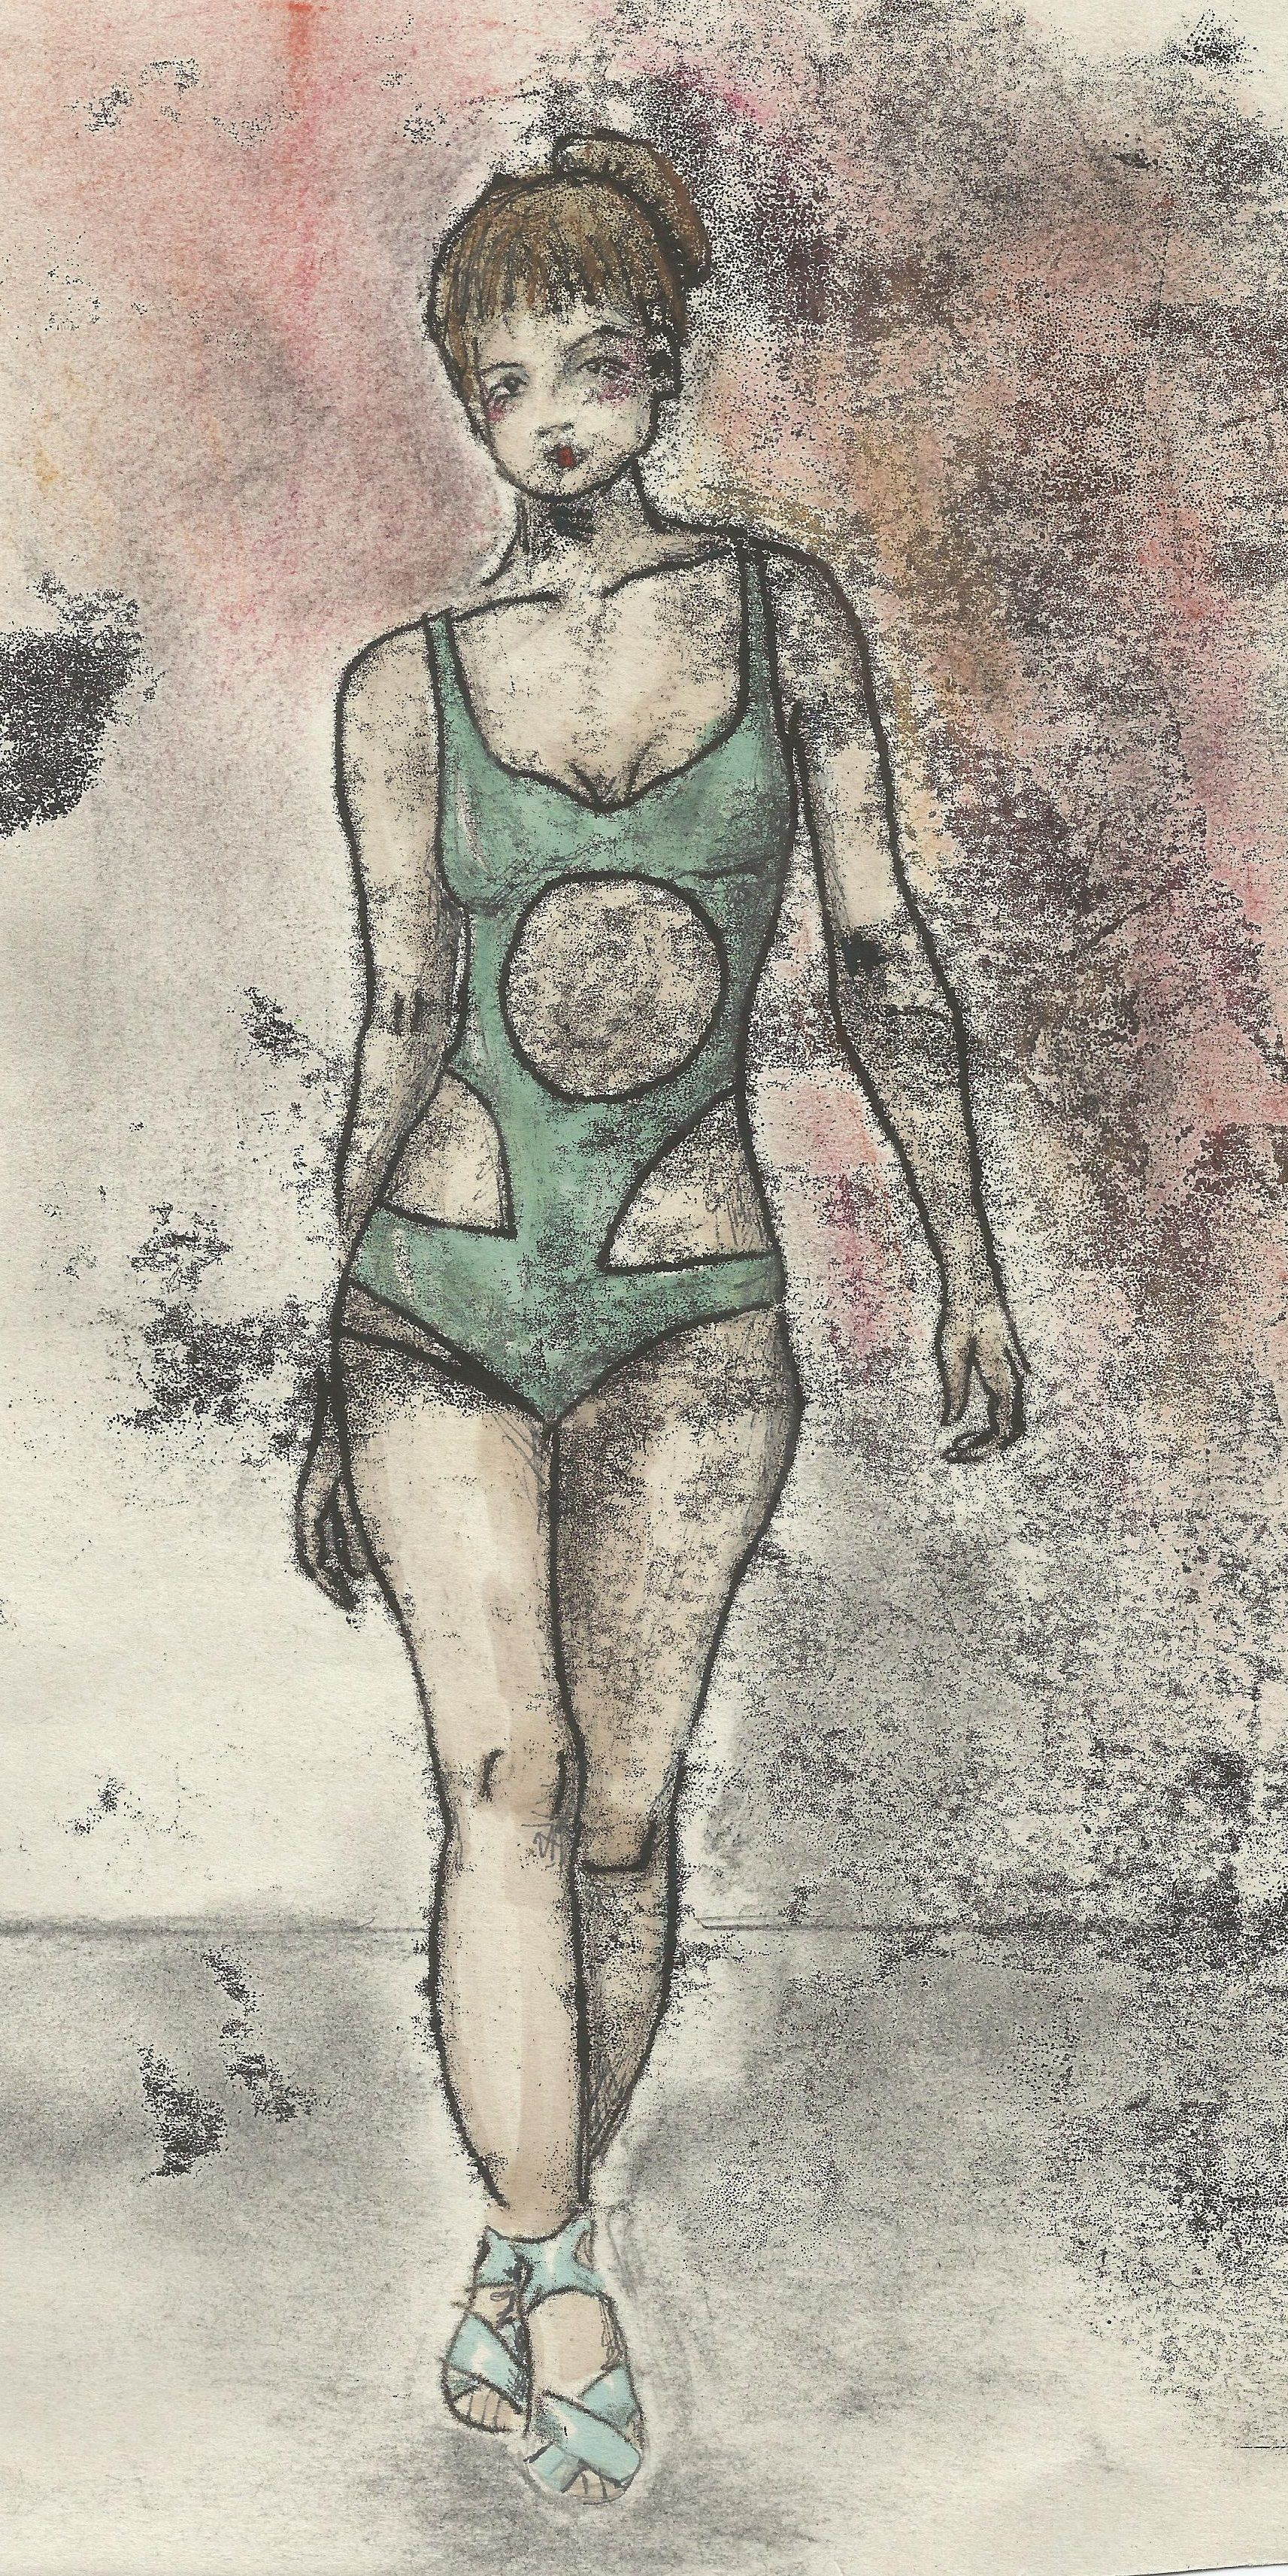 Alternative design for Mariette in Blade Runner 2049 as part